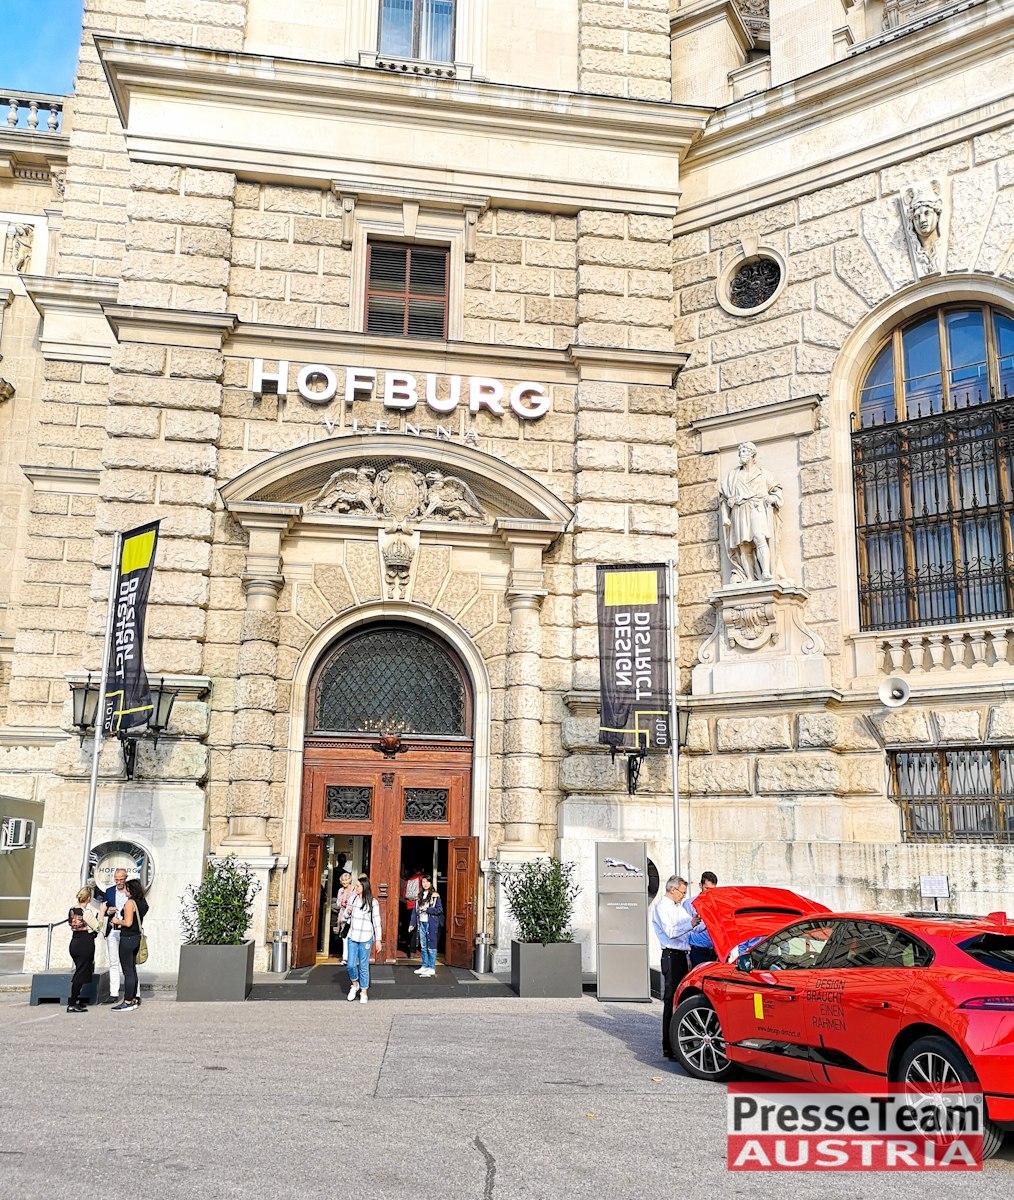 Messe Hofburg Wien 134 - Luxus Möbelmesse & Lifestyle in der Hofburg Wien